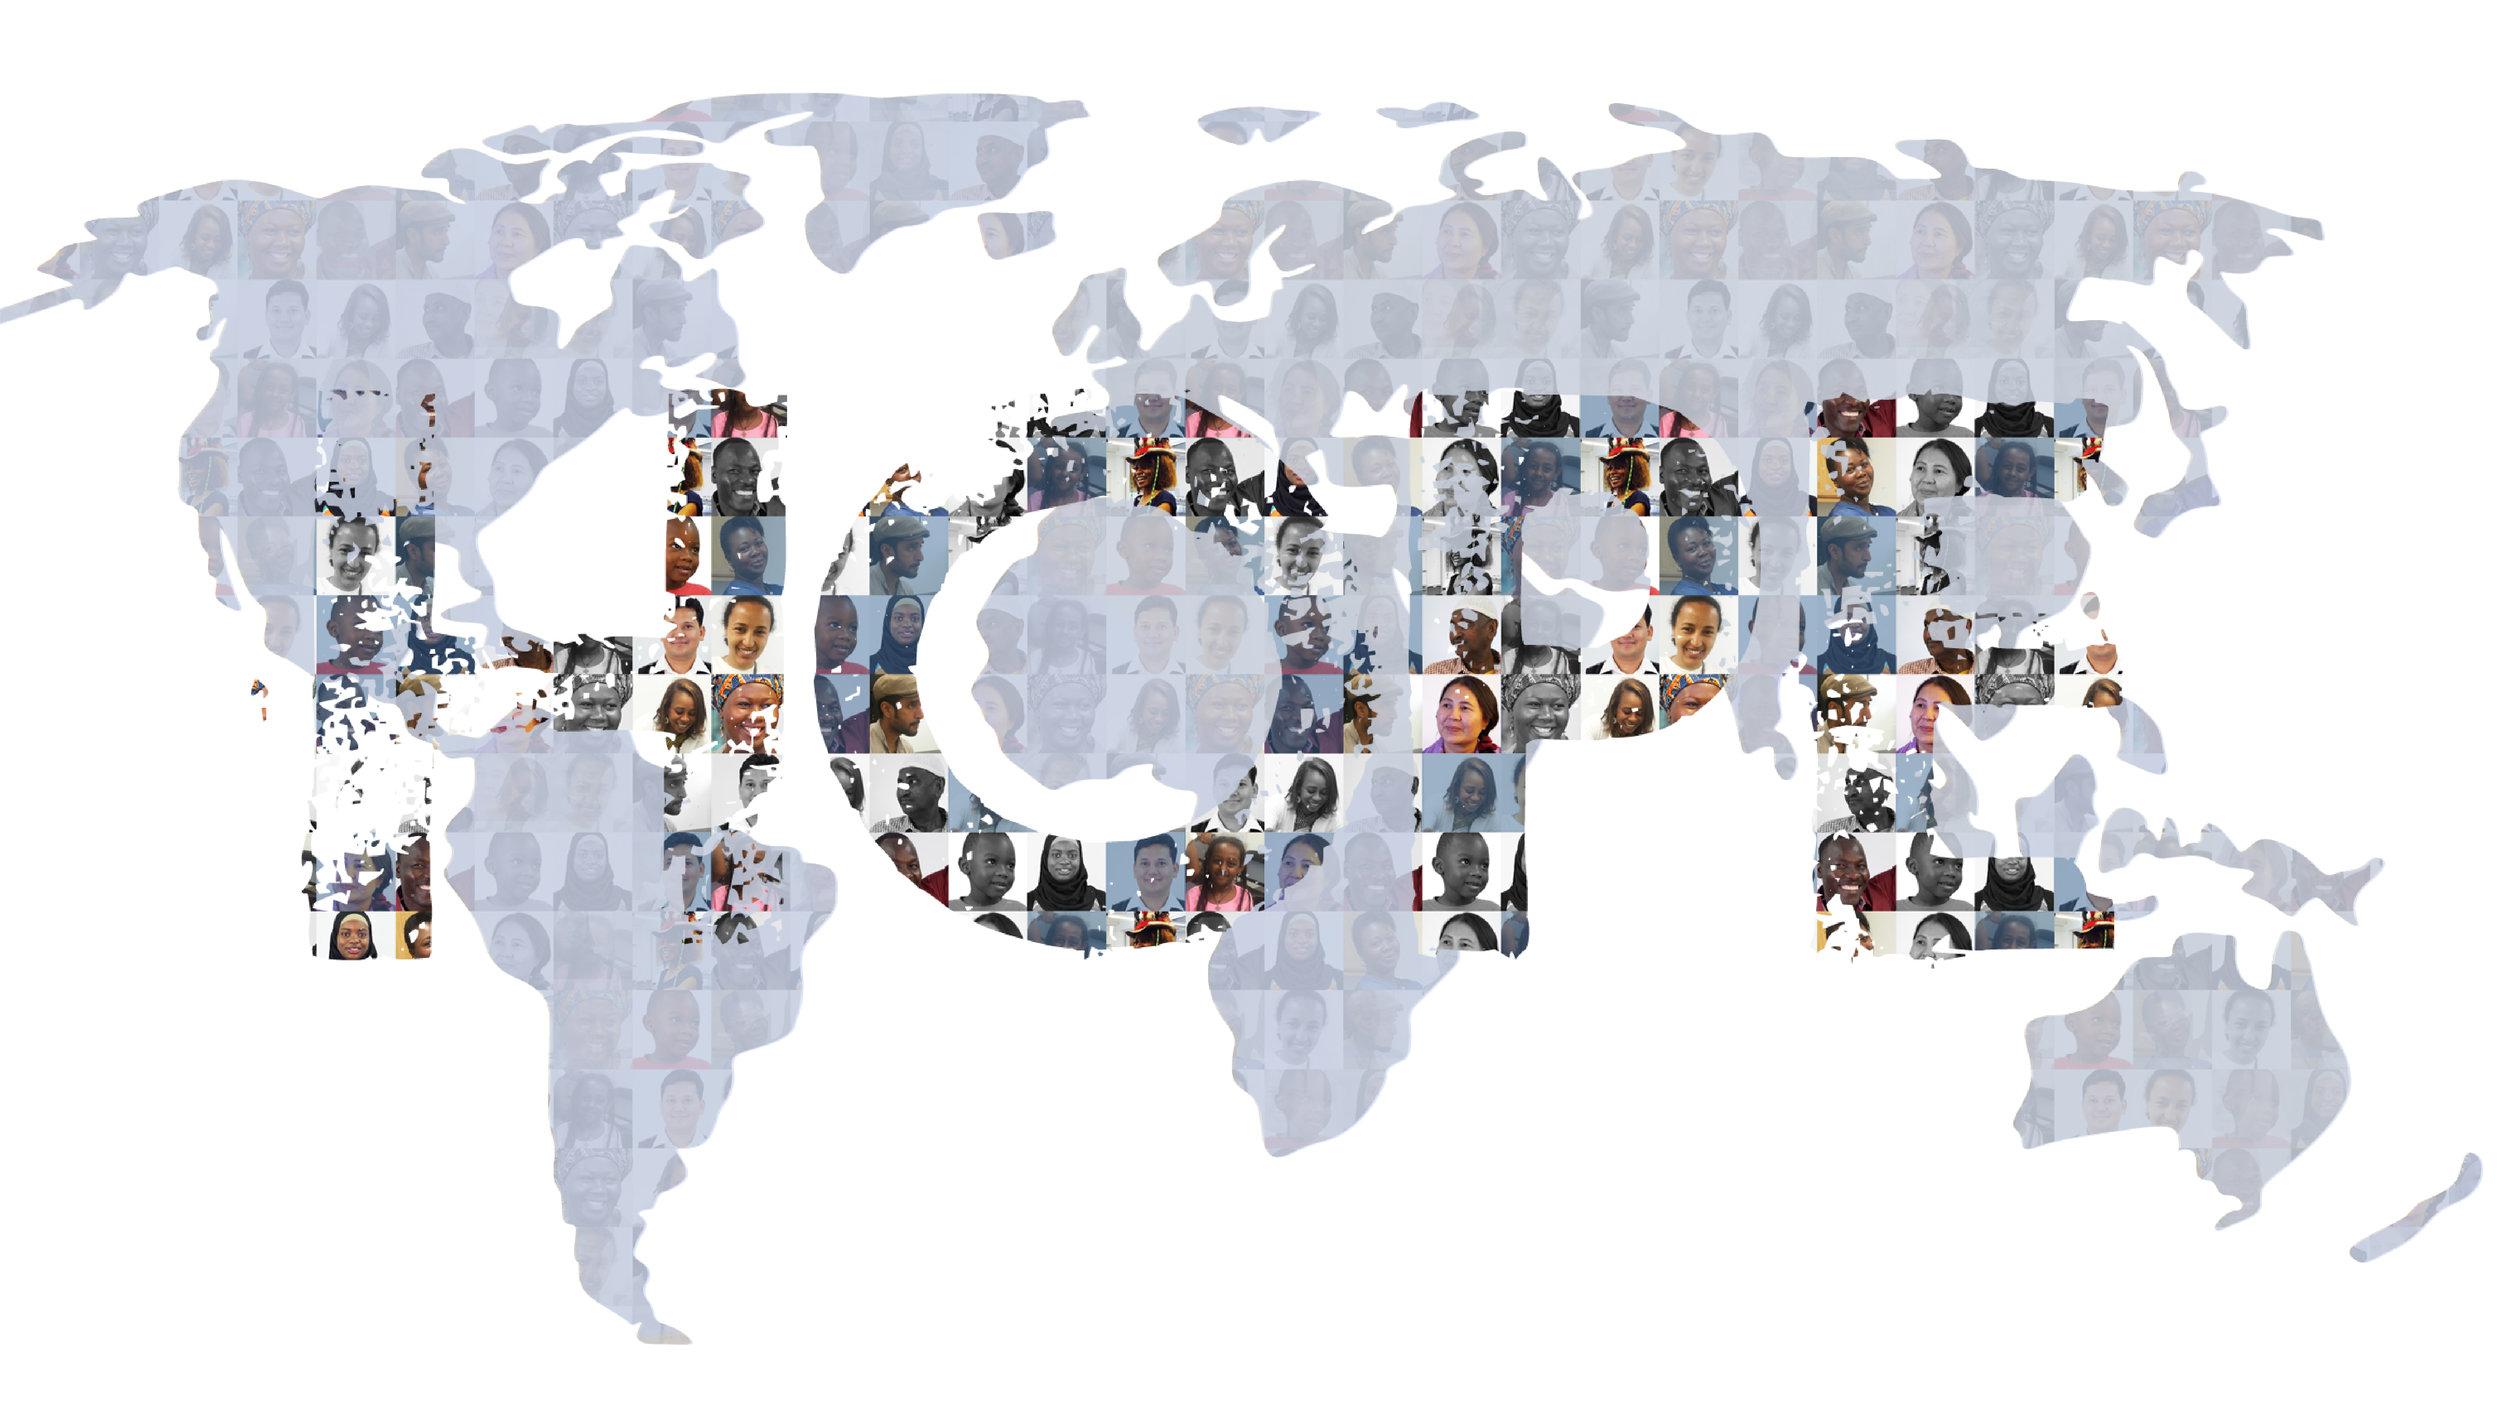 Colorado African Organization - Hope - World Map.jpg